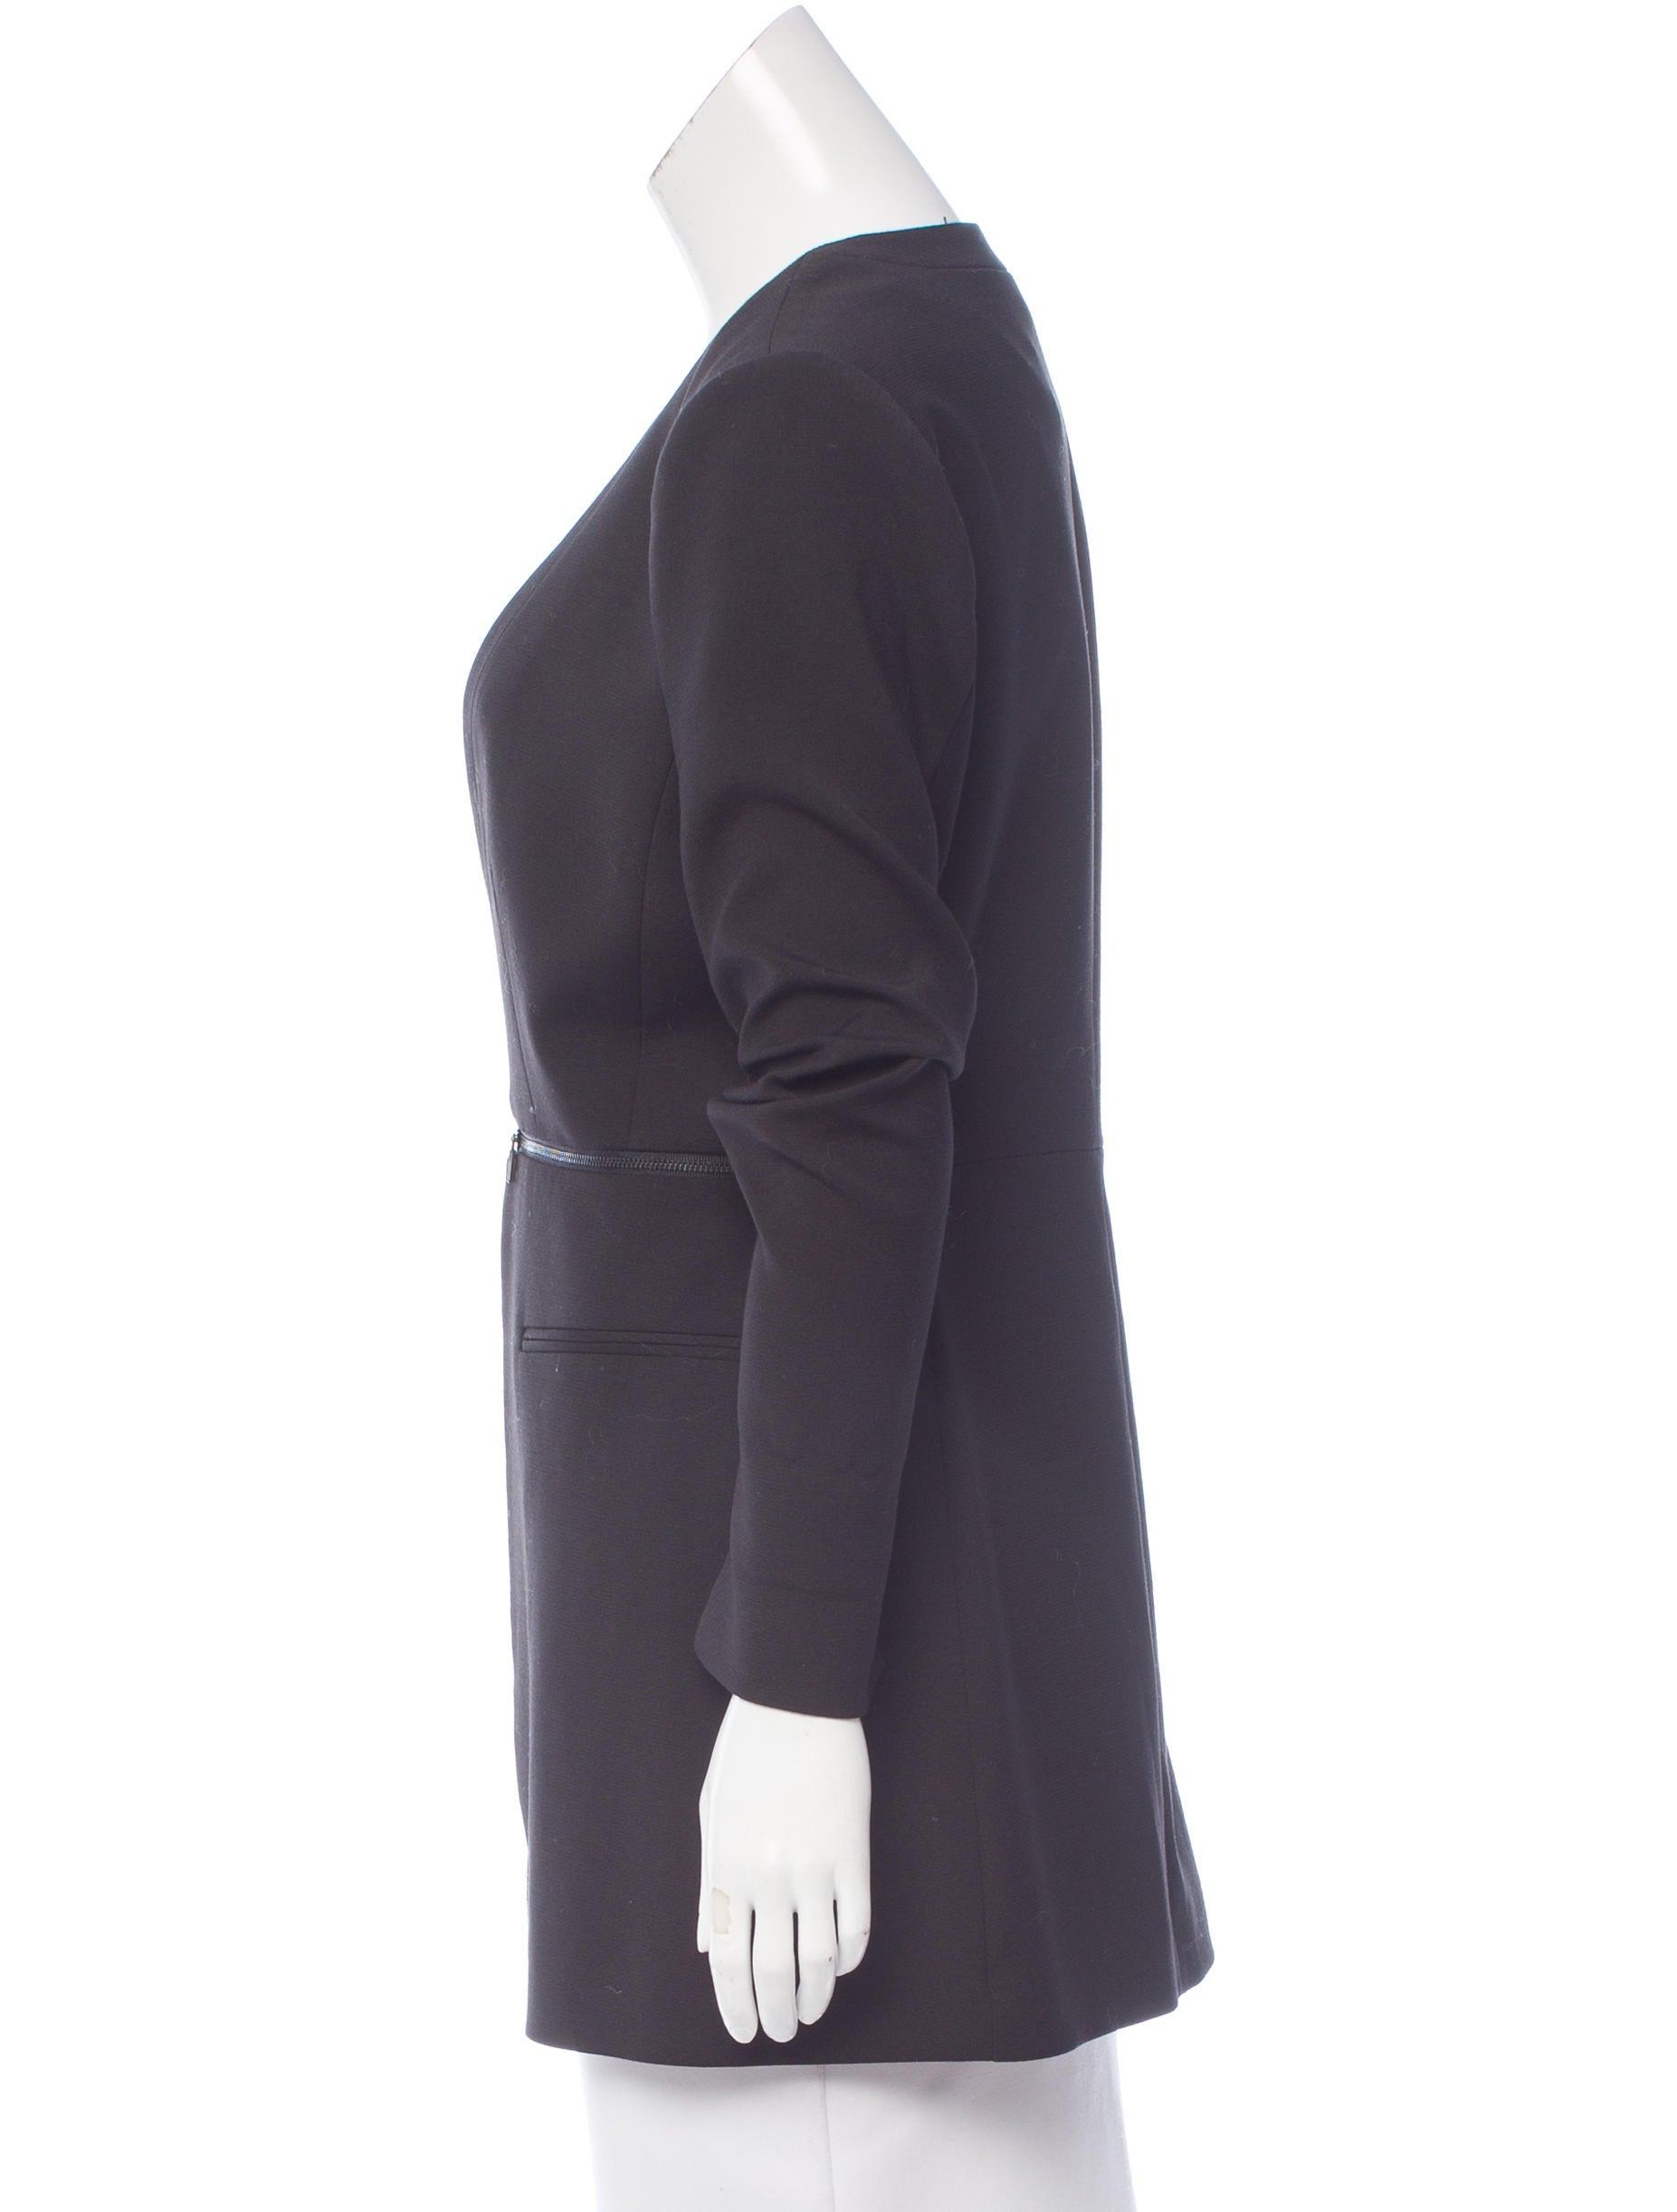 Bcbg max azria hoodie